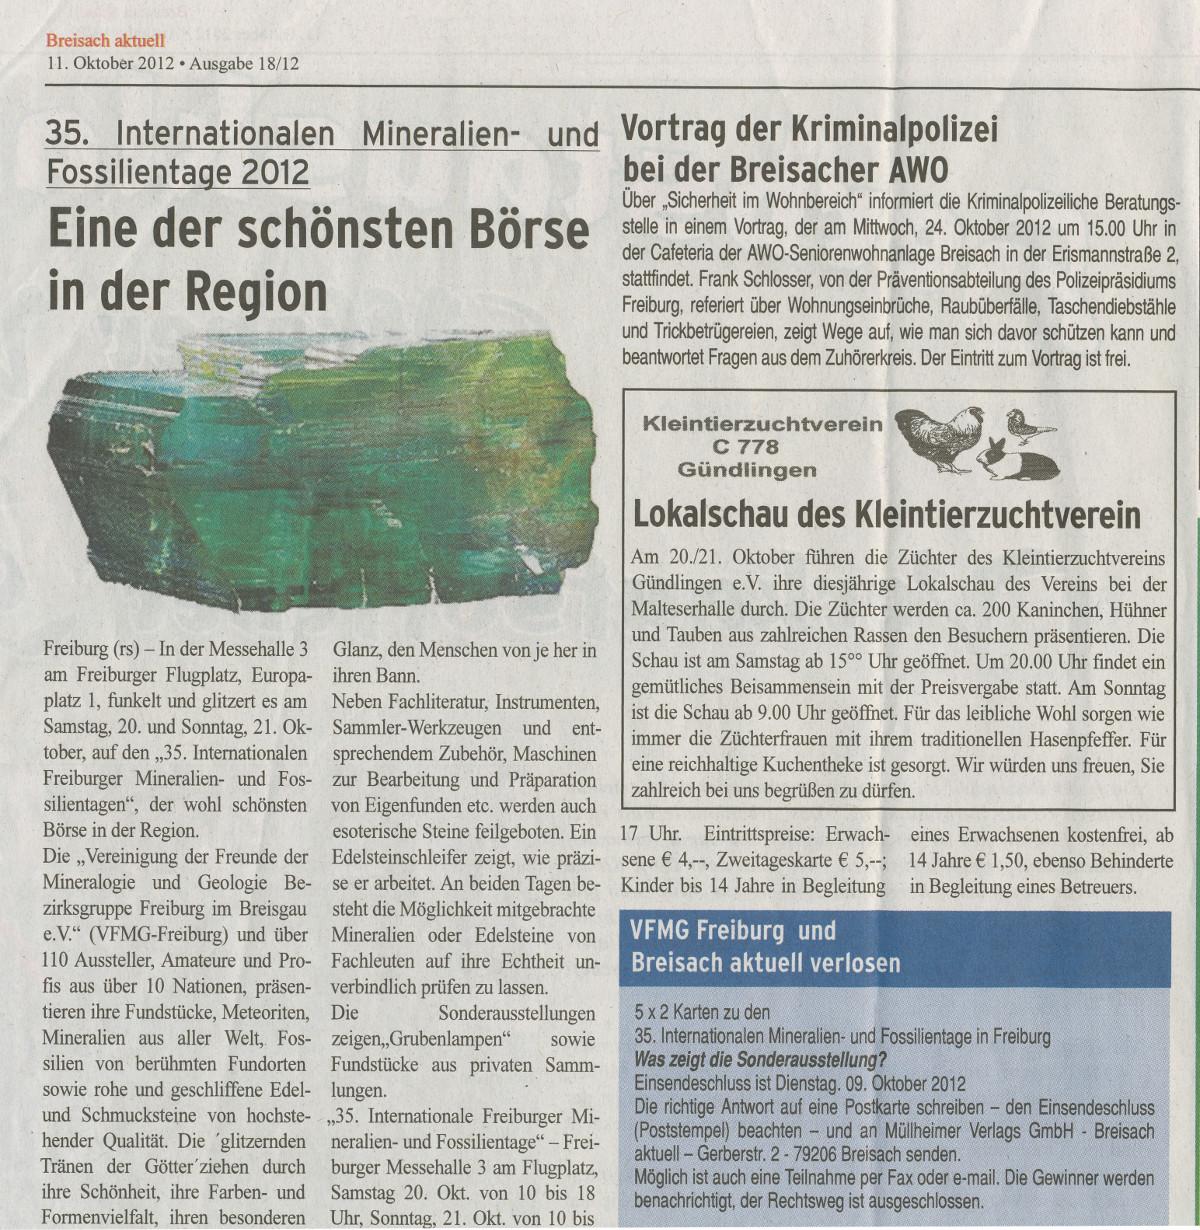 bz freiburg aktuell